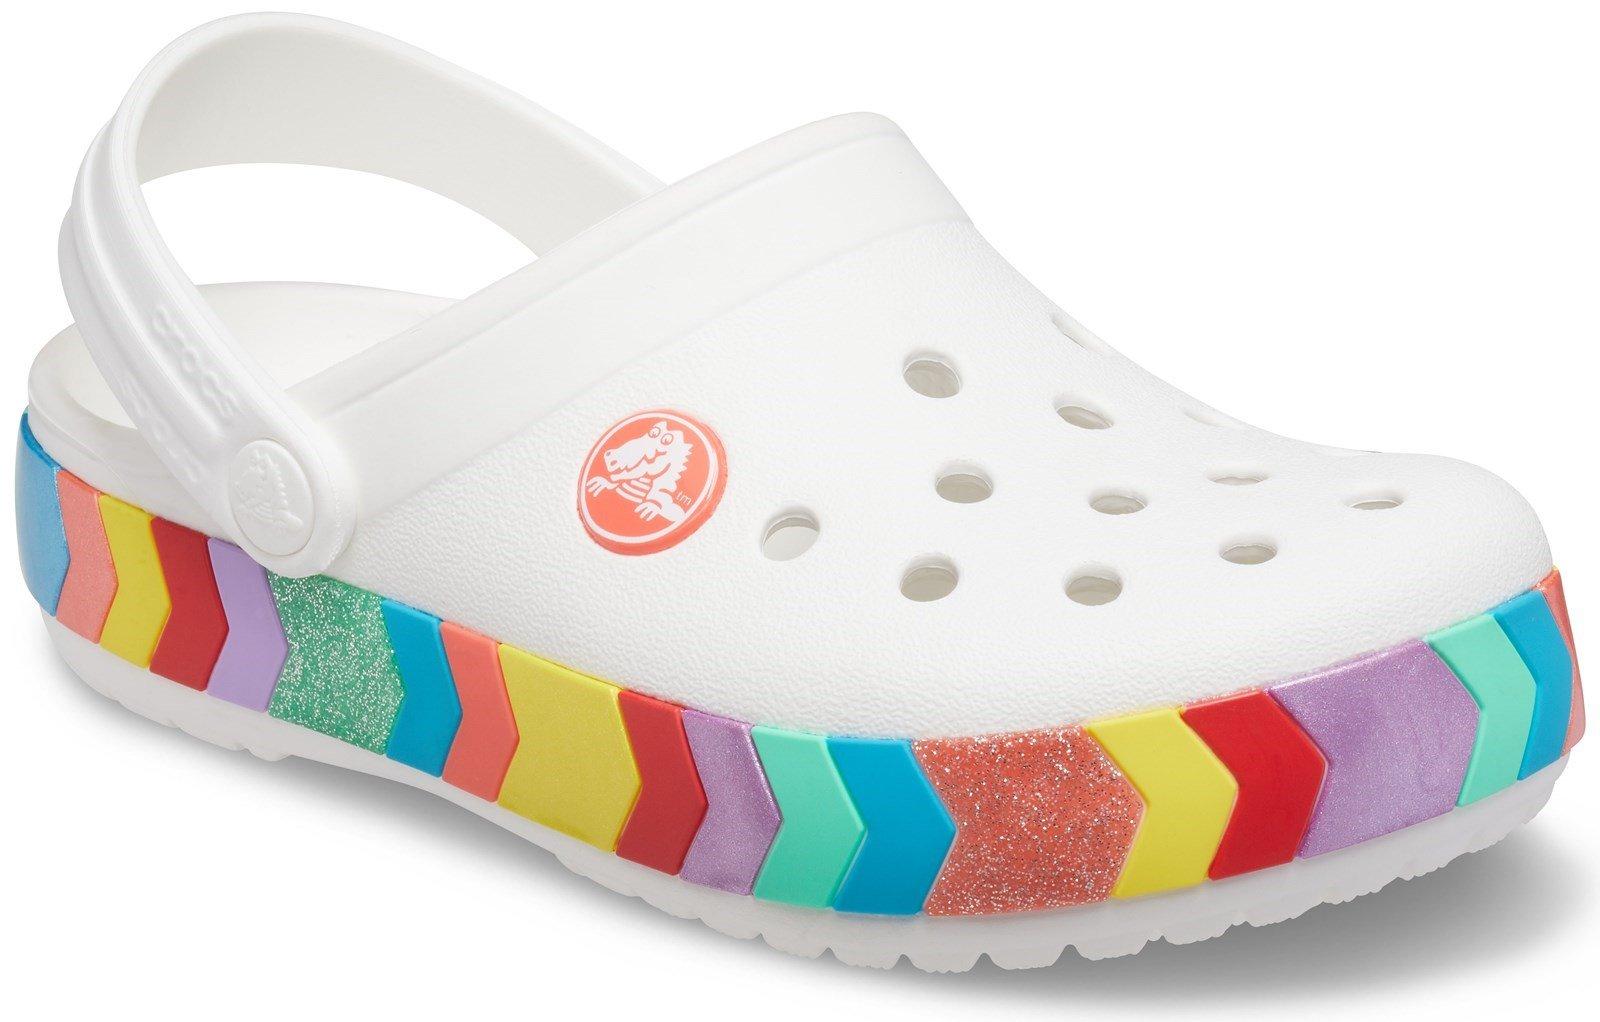 Crocs Kid's Crocband Chevron Beaded Clog Sandal White 31880 - White 4